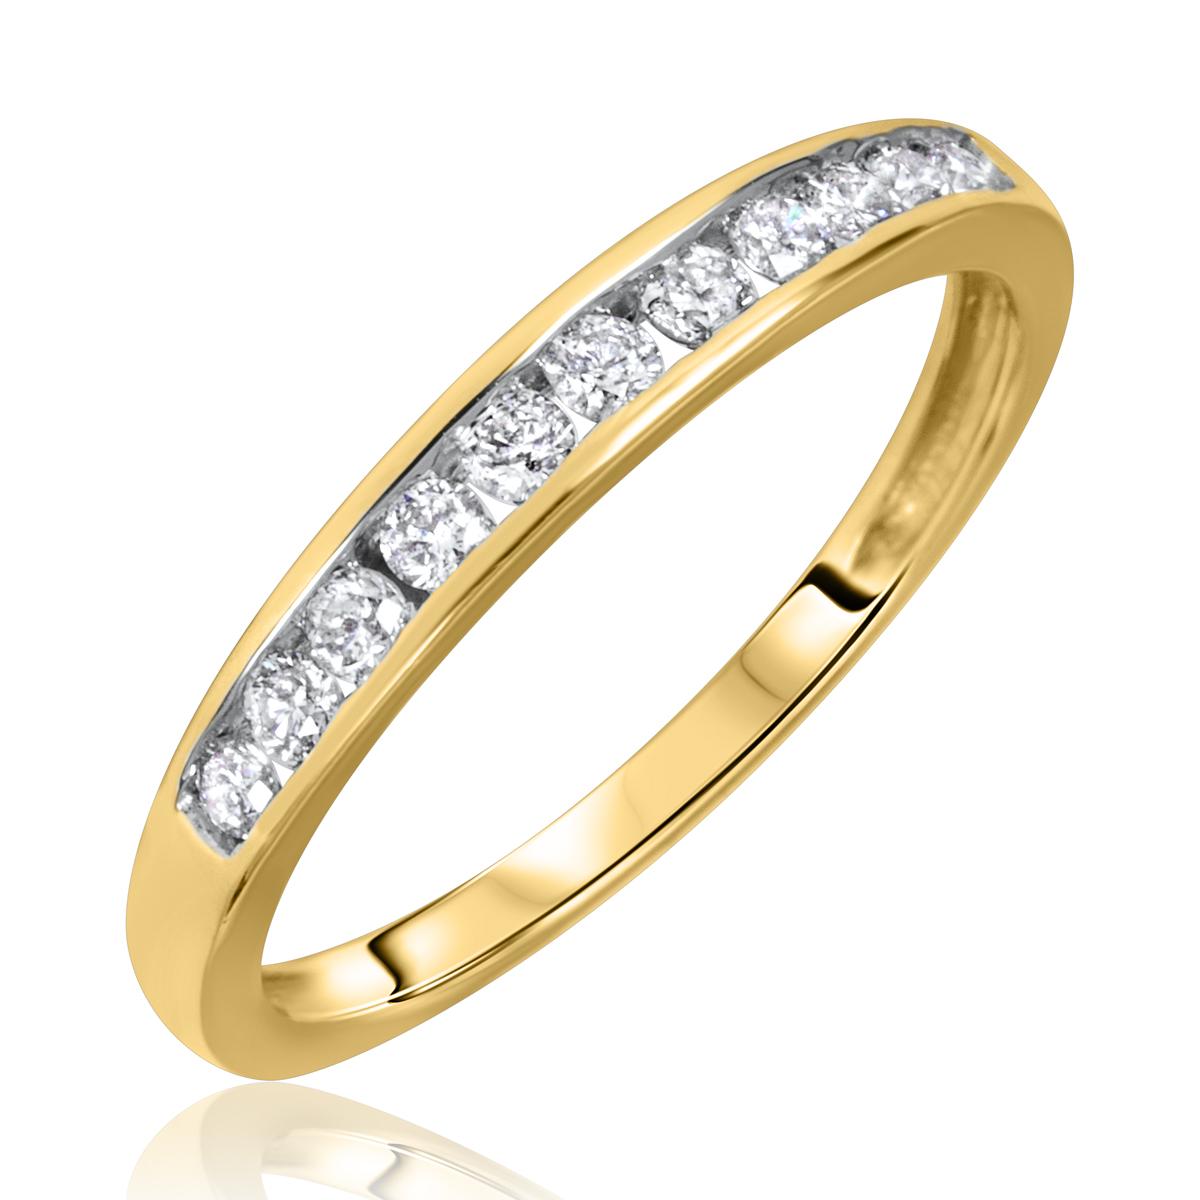 1/4 Carat T.W. Round Cut Diamond Ladies Wedding Band 10K Yellow Gold- Size 8